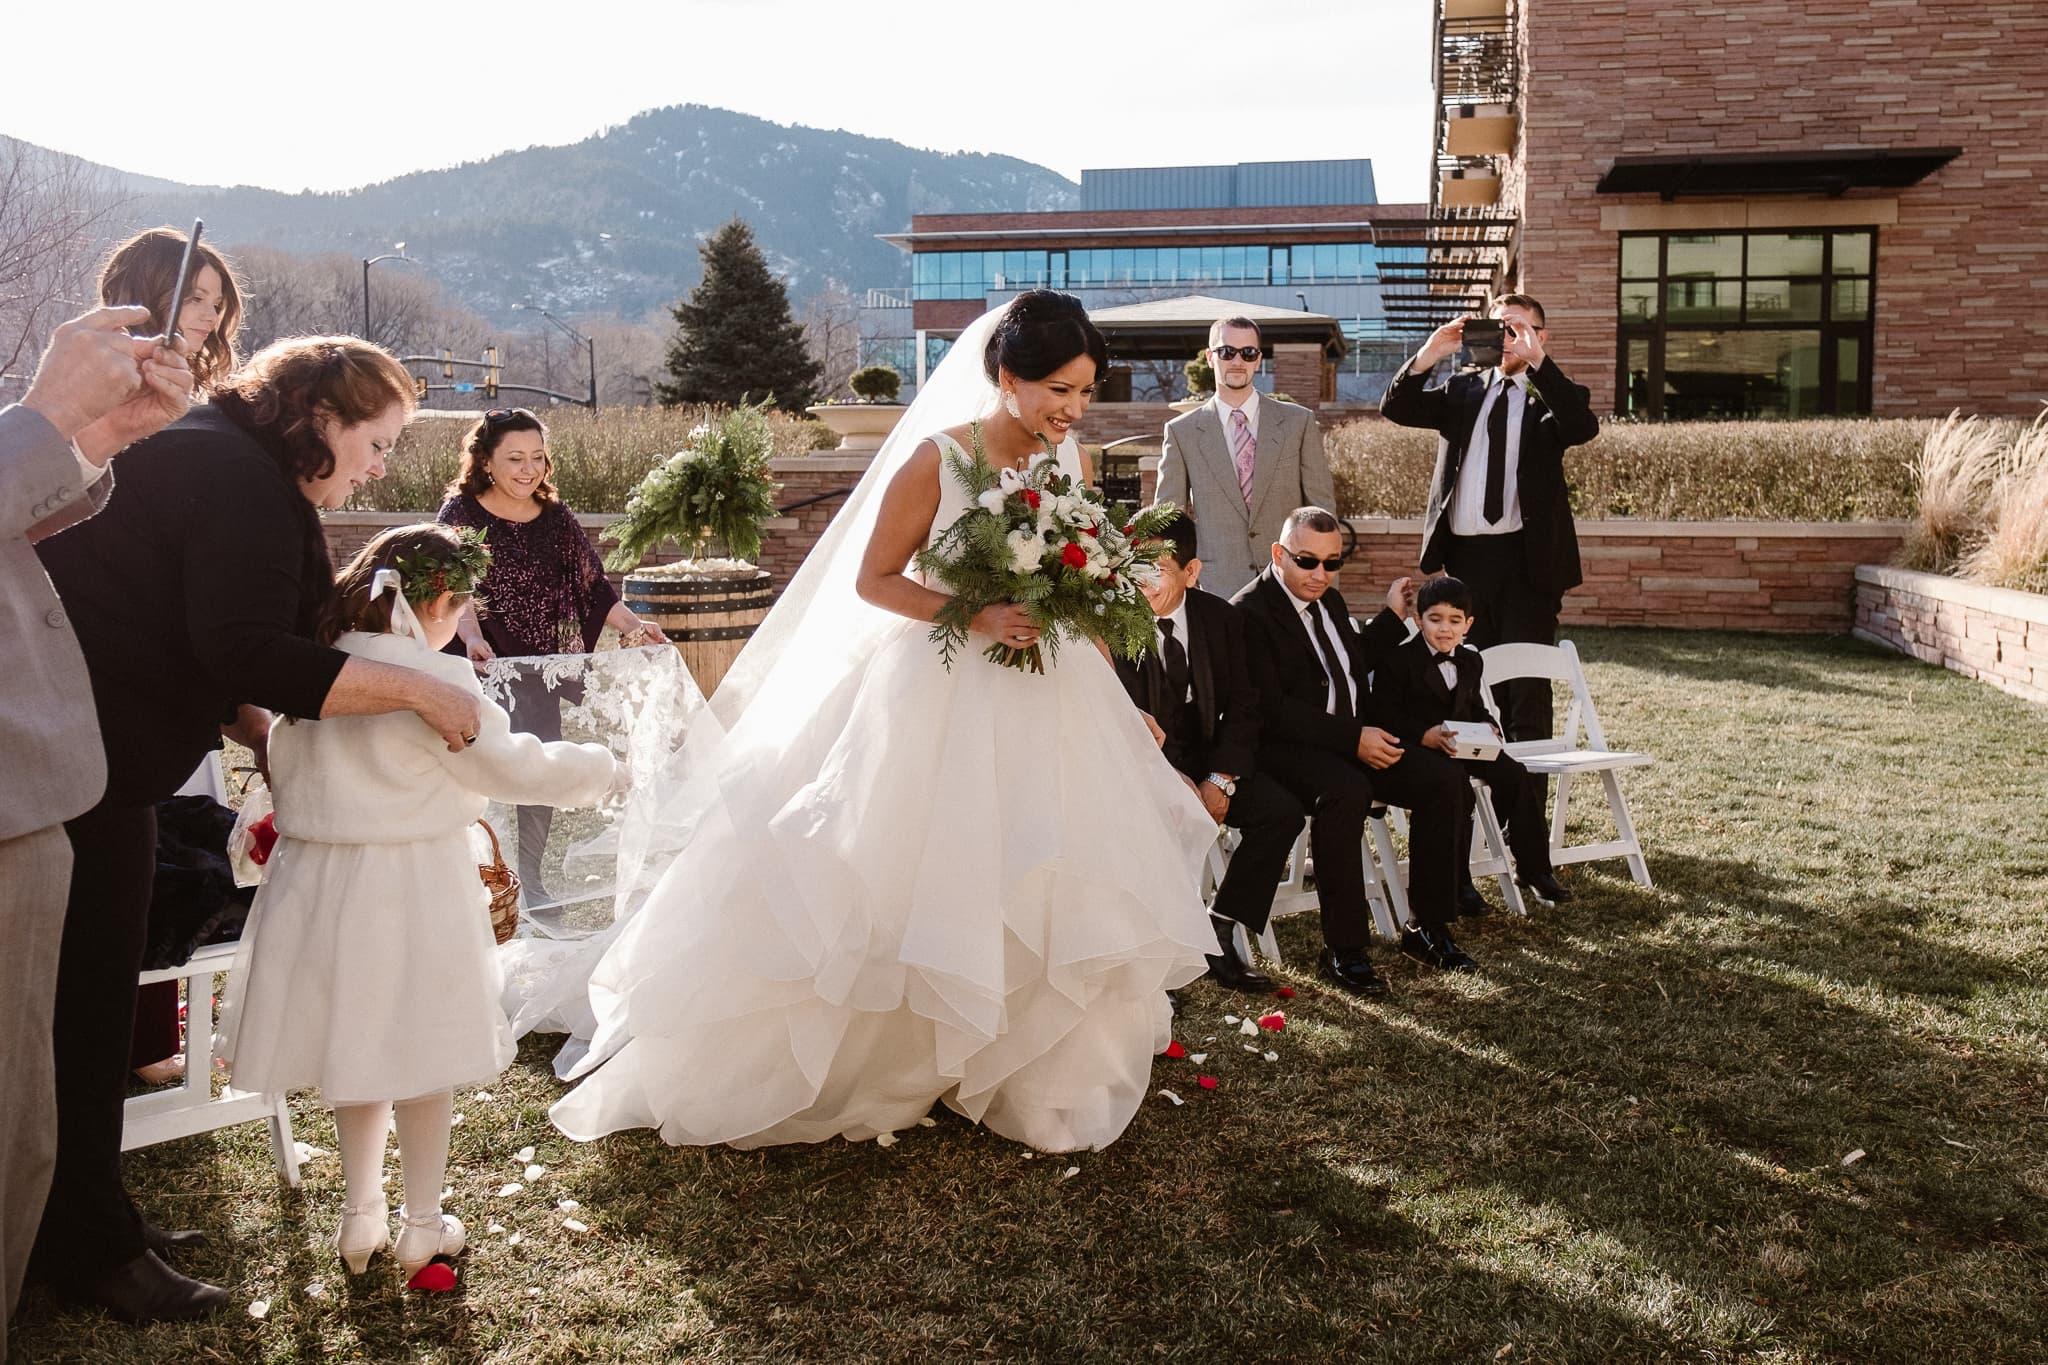 St Julien wedding photographer, The St Julien Hotel & Spa wedding ceremony in downtown Boulder, Boulder wedding photographer, bride walking down the aisle